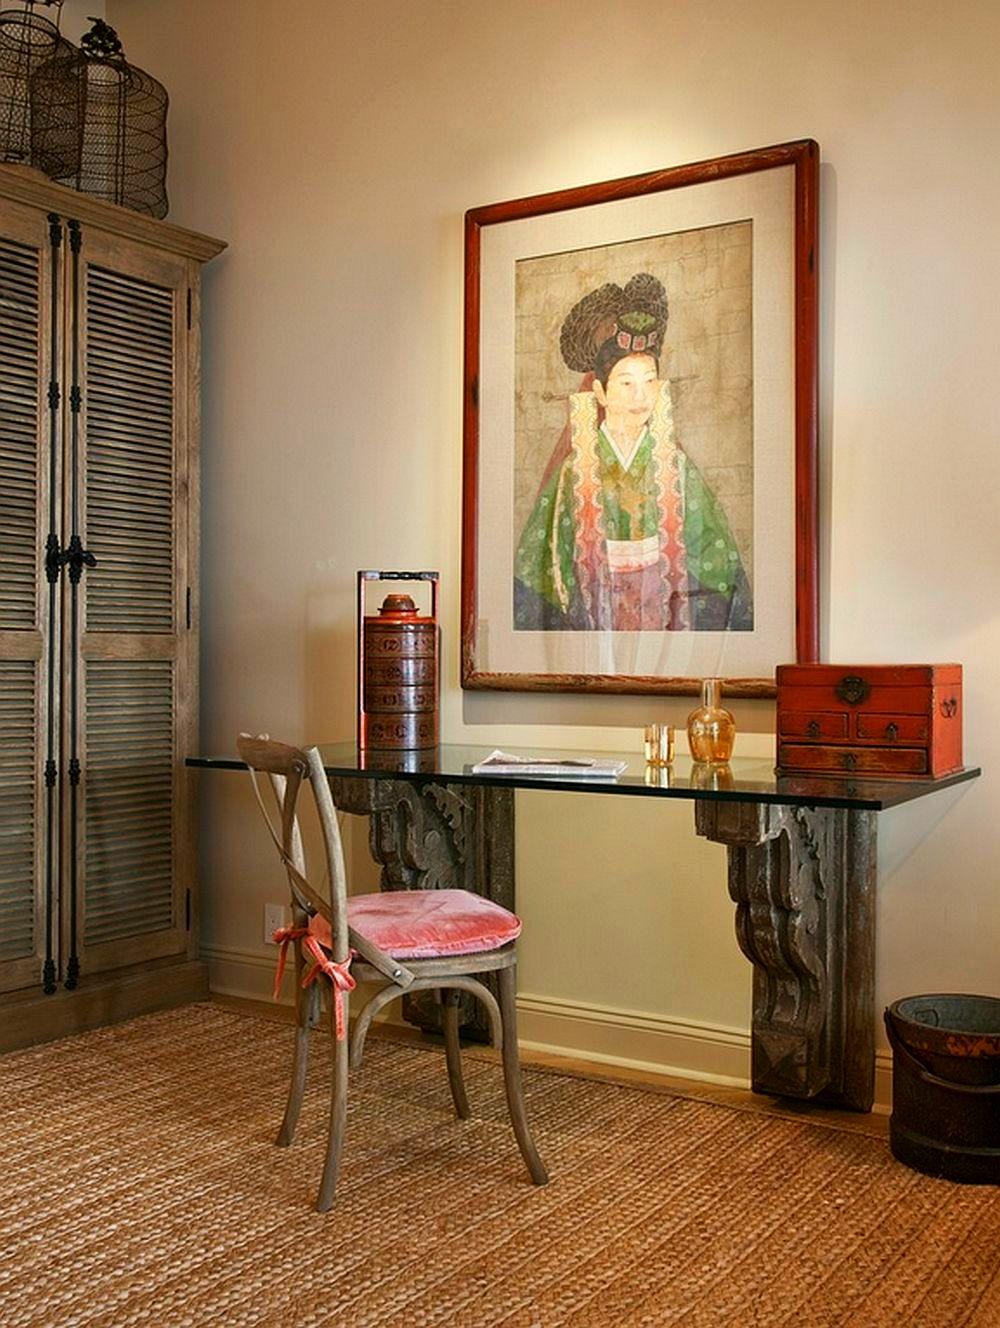 adelaparvu.com despre loft in stil eclectic cu influente marocane, morrocan style, designer Deborah French, Foto Yiorgos Kordakis (11)